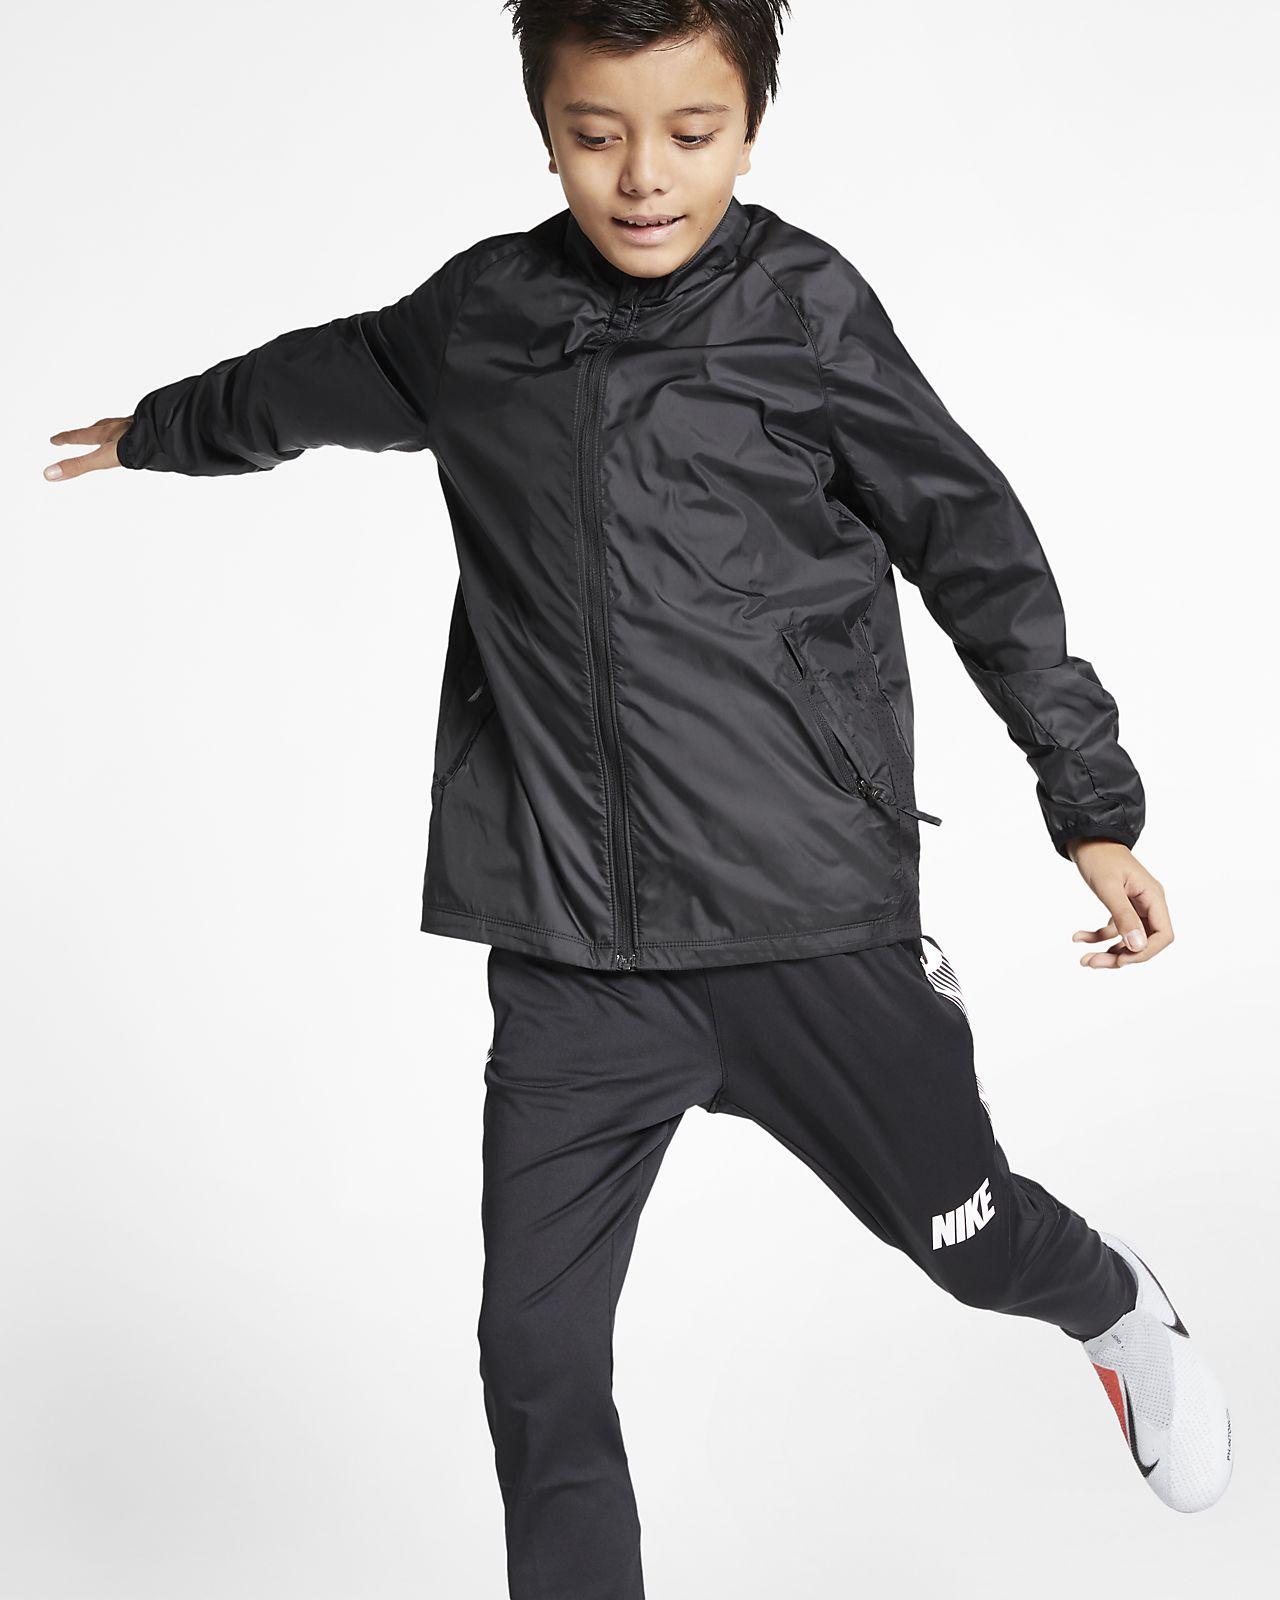 Chamarra de fútbol para niños talla grande Nike Academy